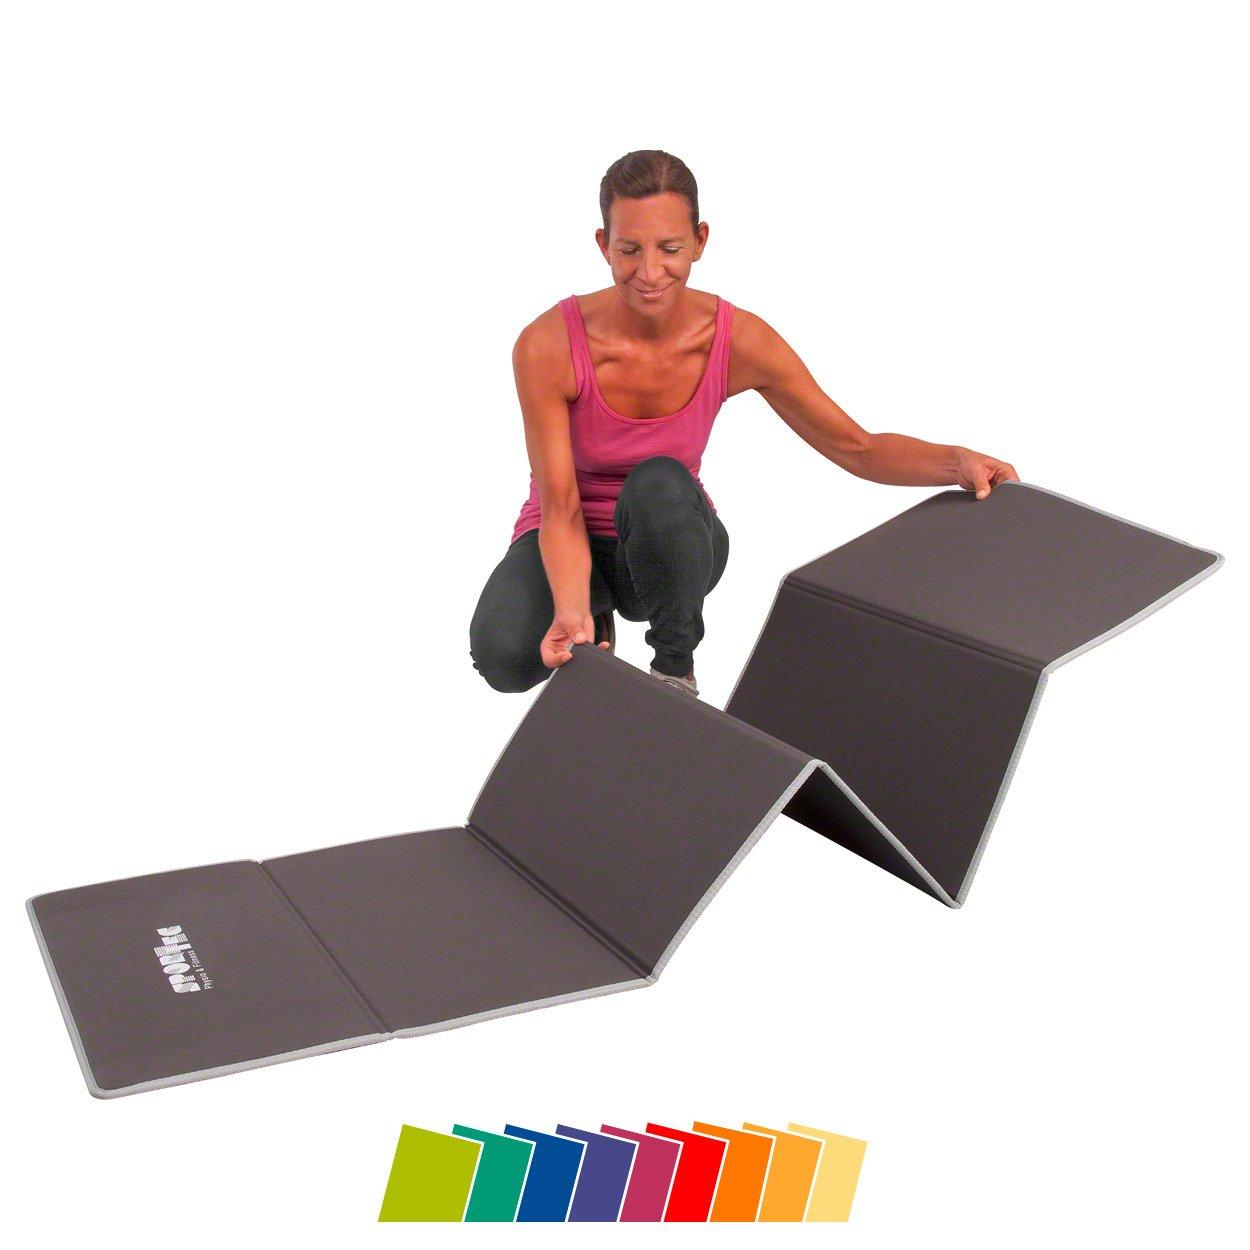 Gymnastikmatte faltbar, LxBxH 180x60x0,7 cm, grau grau <br /> Sport-Tec